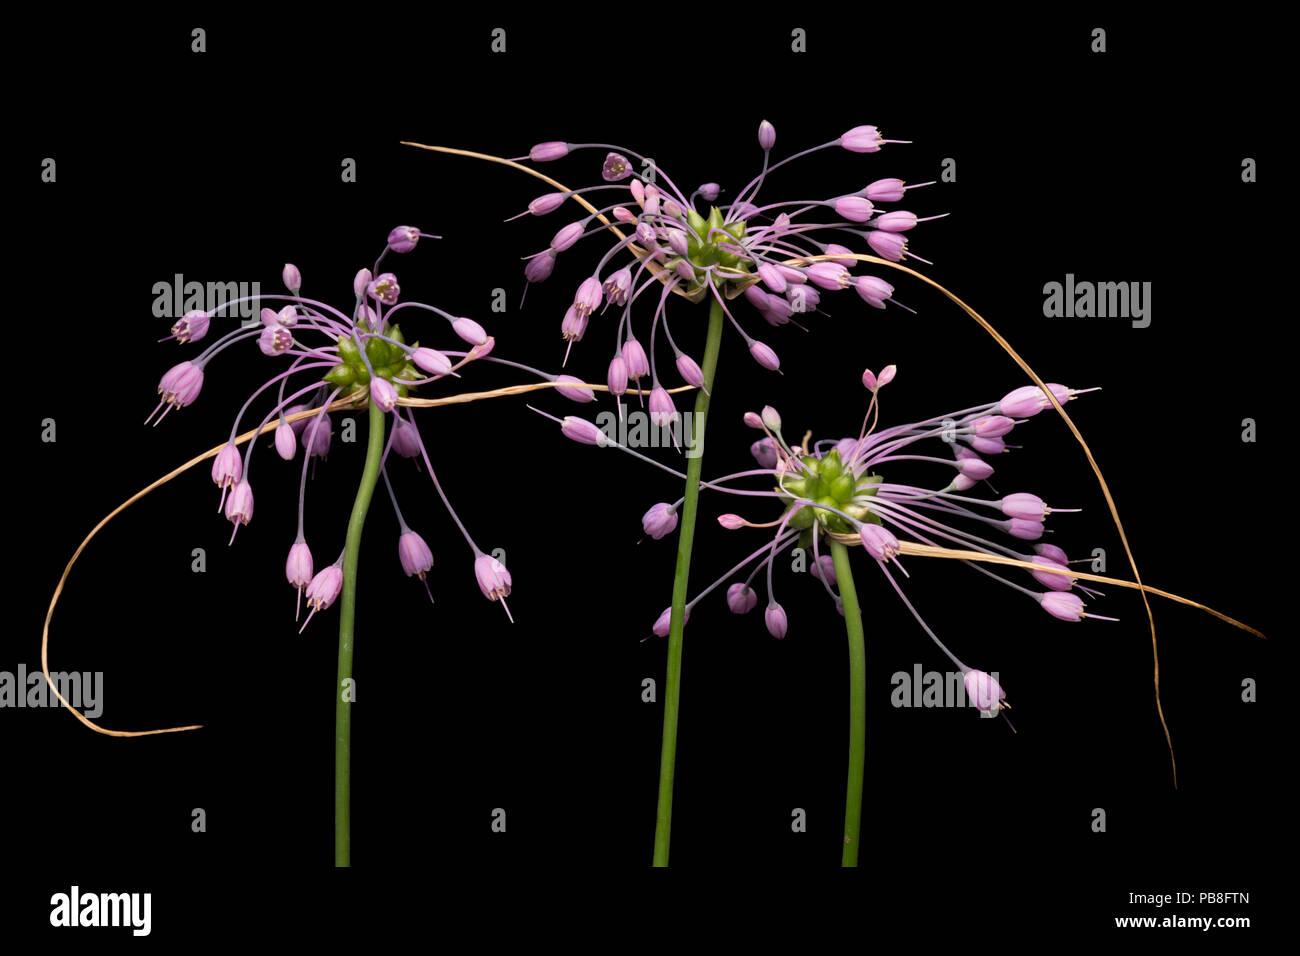 Keeled garlic flowers (Allium carinatum subsp. carinatum) flowers on black background,  Julian Alps, Slovenia. July - Stock Image